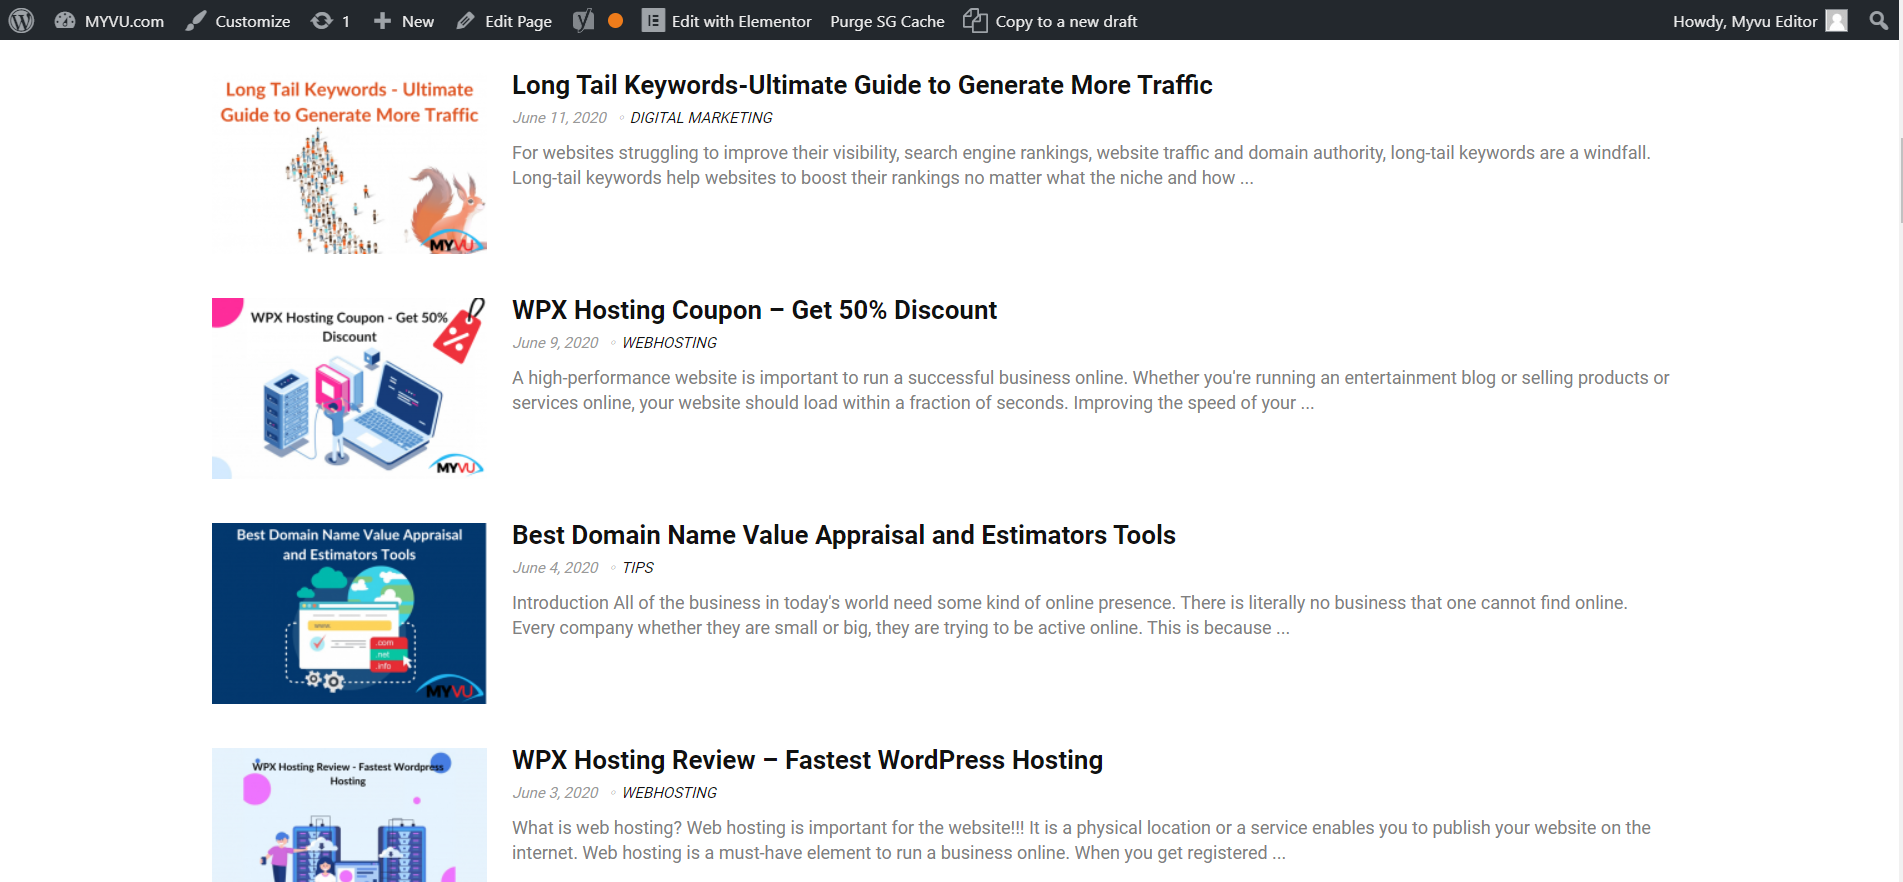 MYVU_com_Blog_to_Learn_Grow_Website_with_Marketing_Make_Money